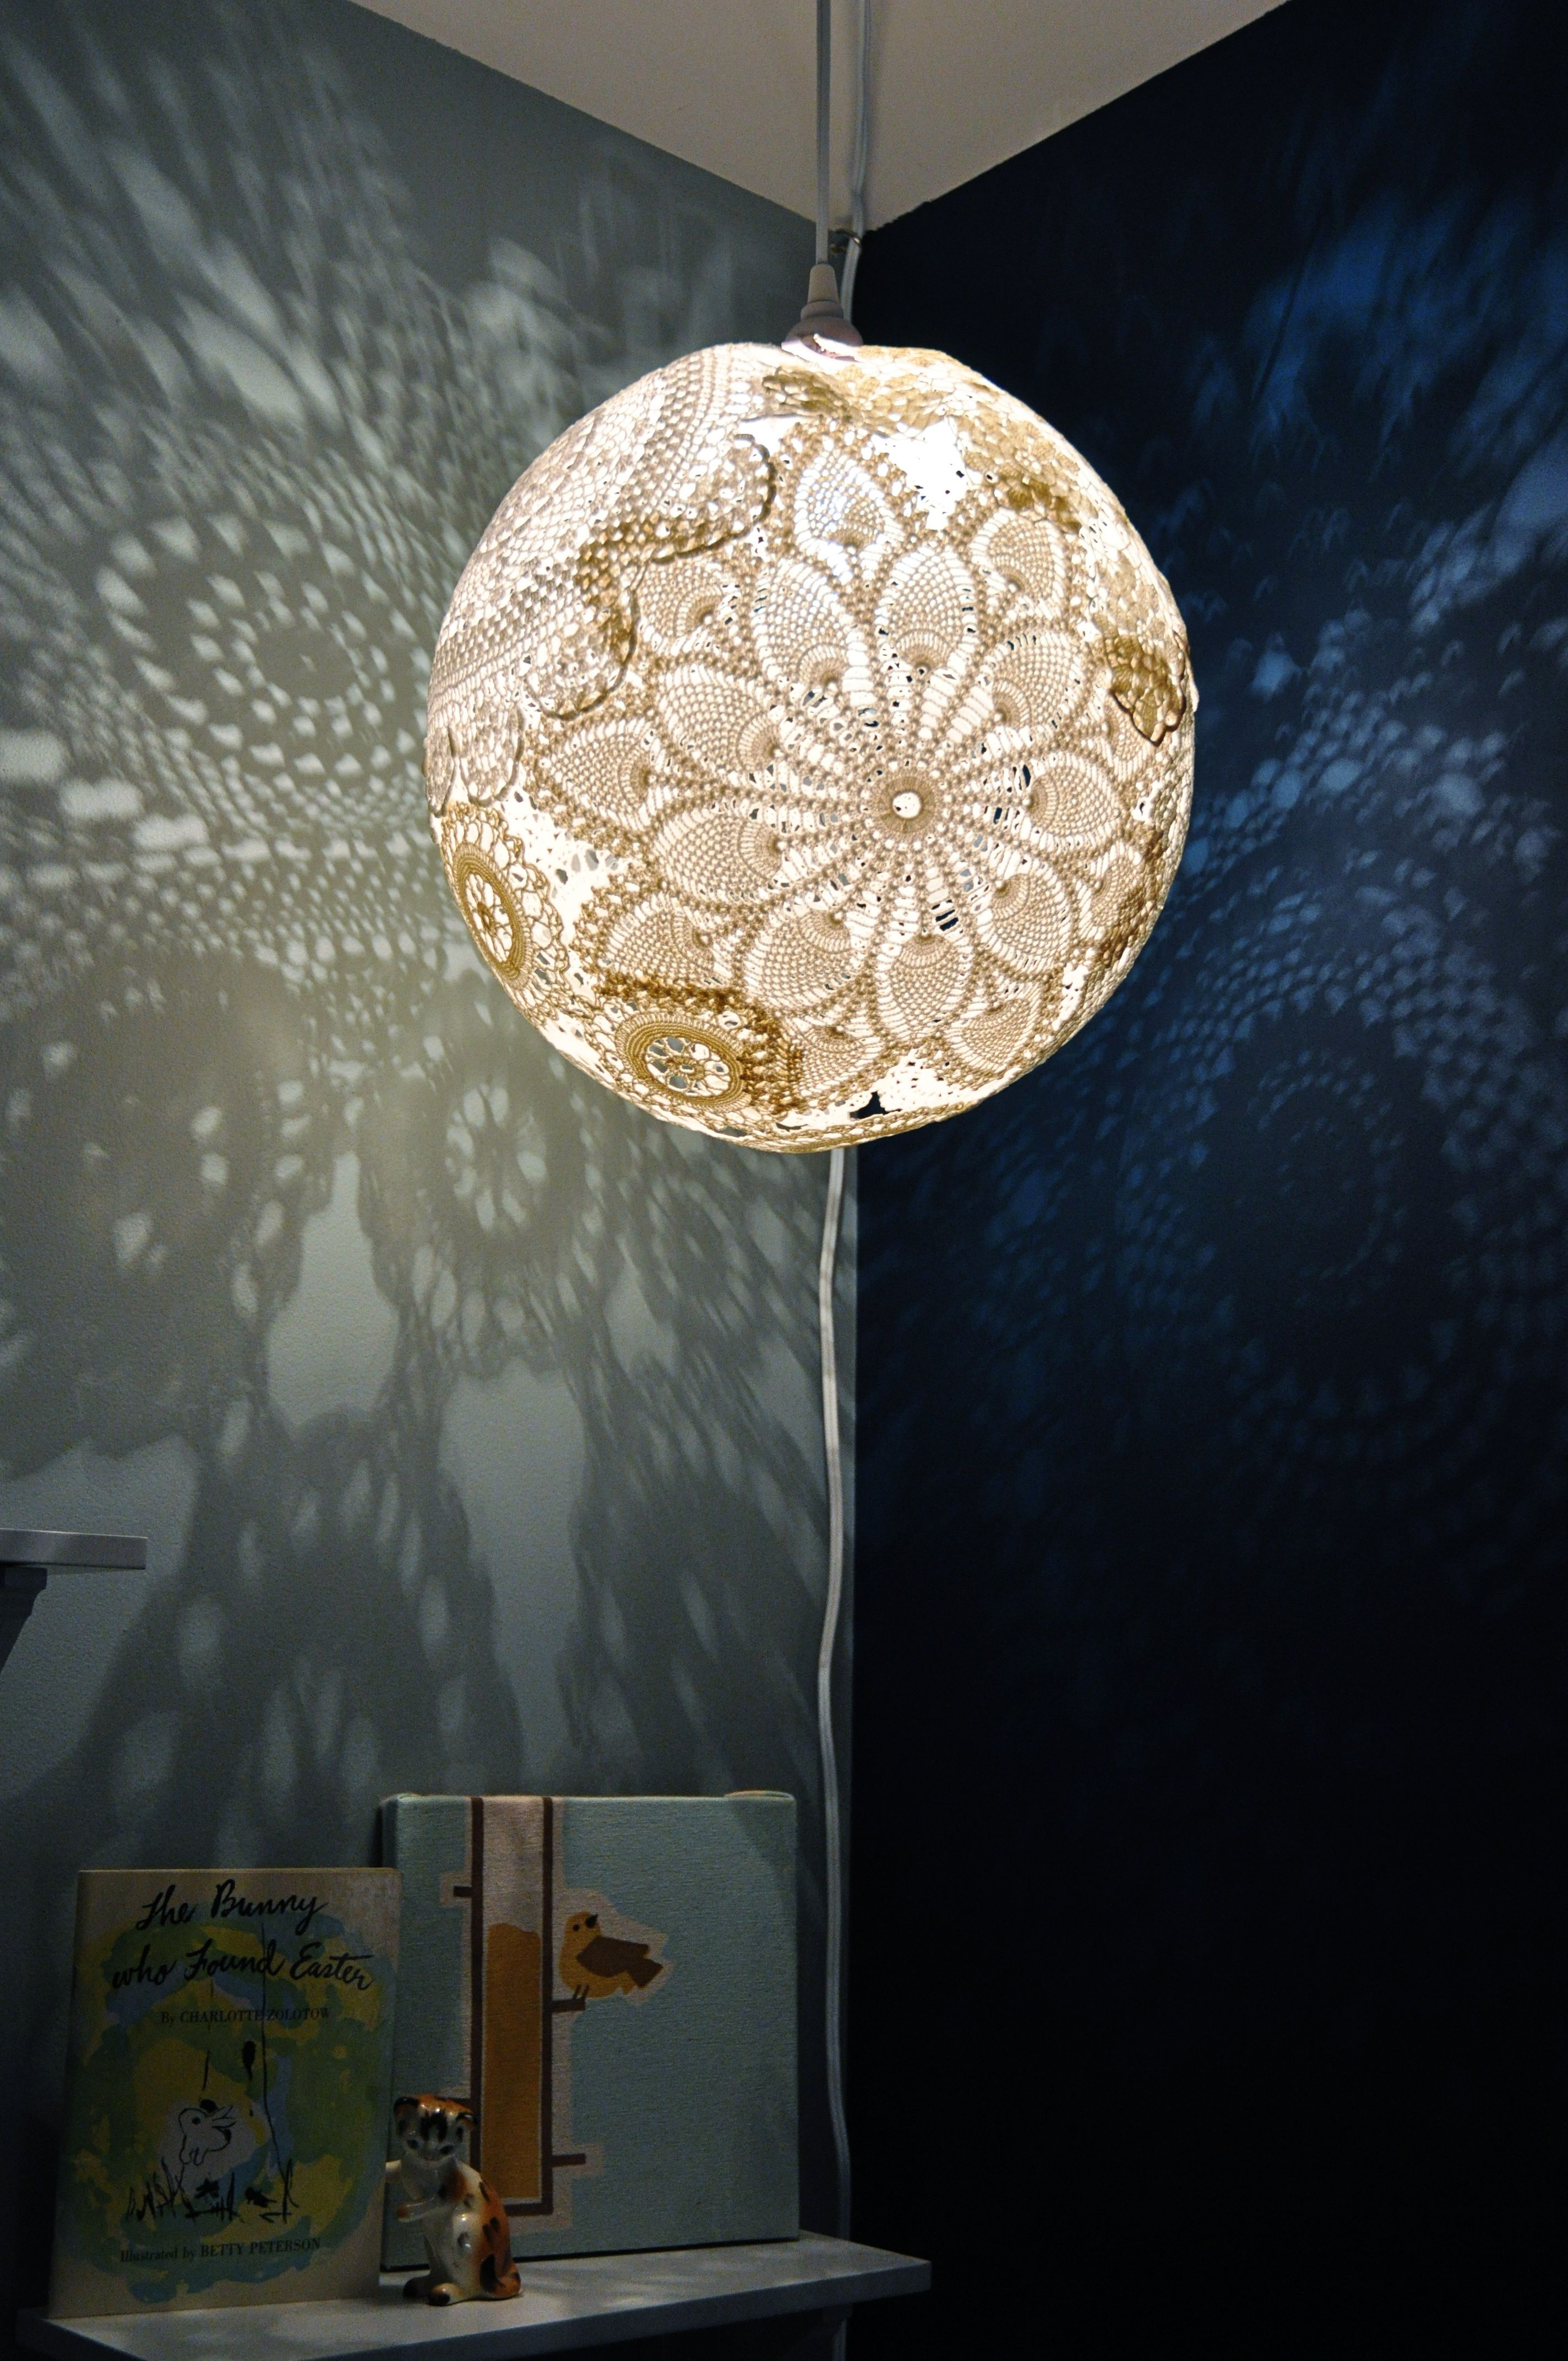 sfeervolle slaapkamer lamp - slaapkamer | pinterest - doily lamp, Deco ideeën